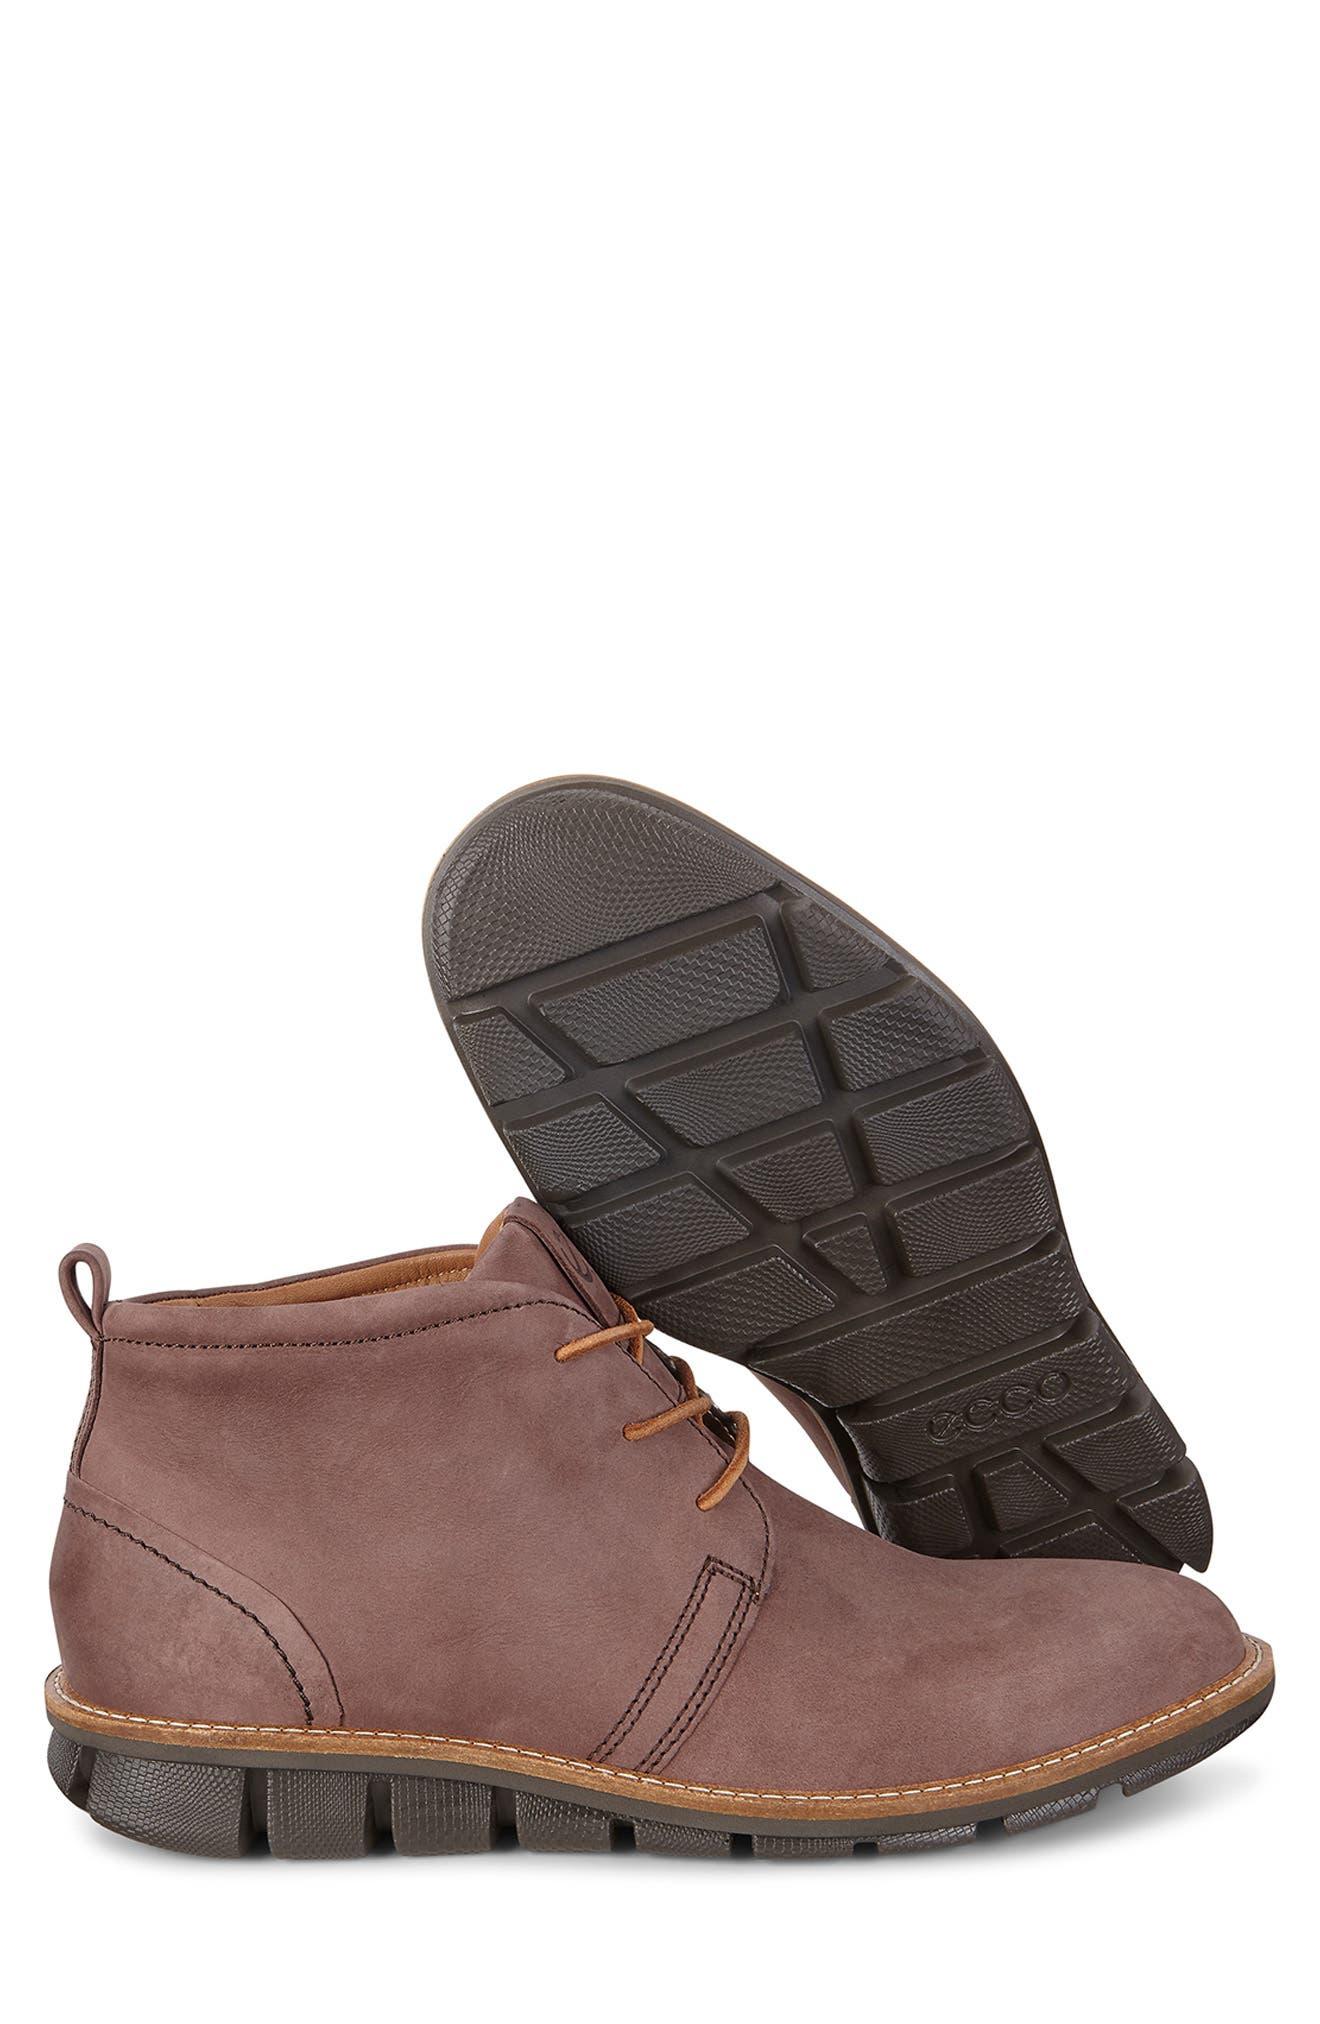 'Jeremy Hybrid' Plain Toe Boot,                             Alternate thumbnail 7, color,                             COFFEE LEATHER